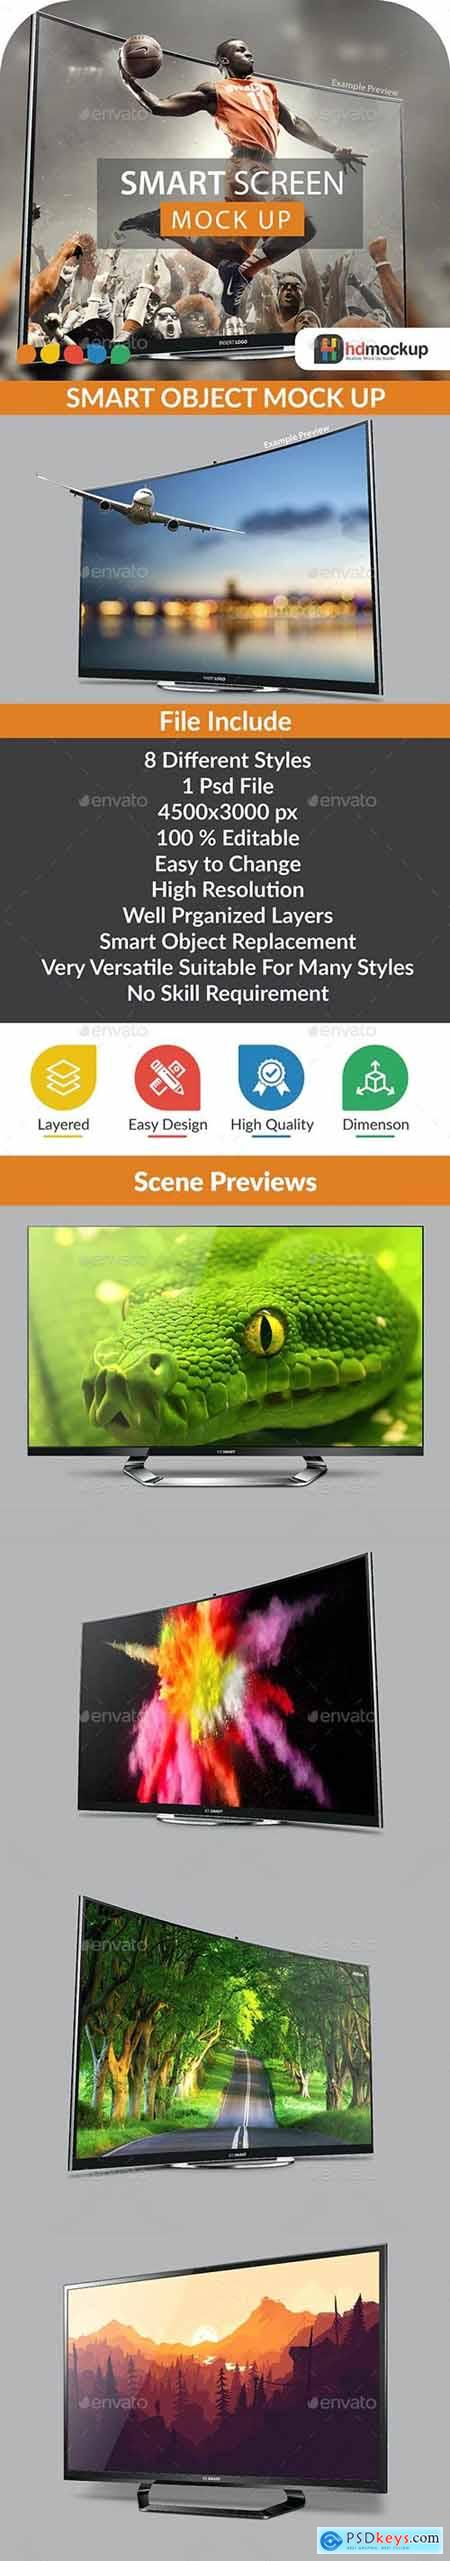 Smart Screen Mock Up - 004 - 29385446